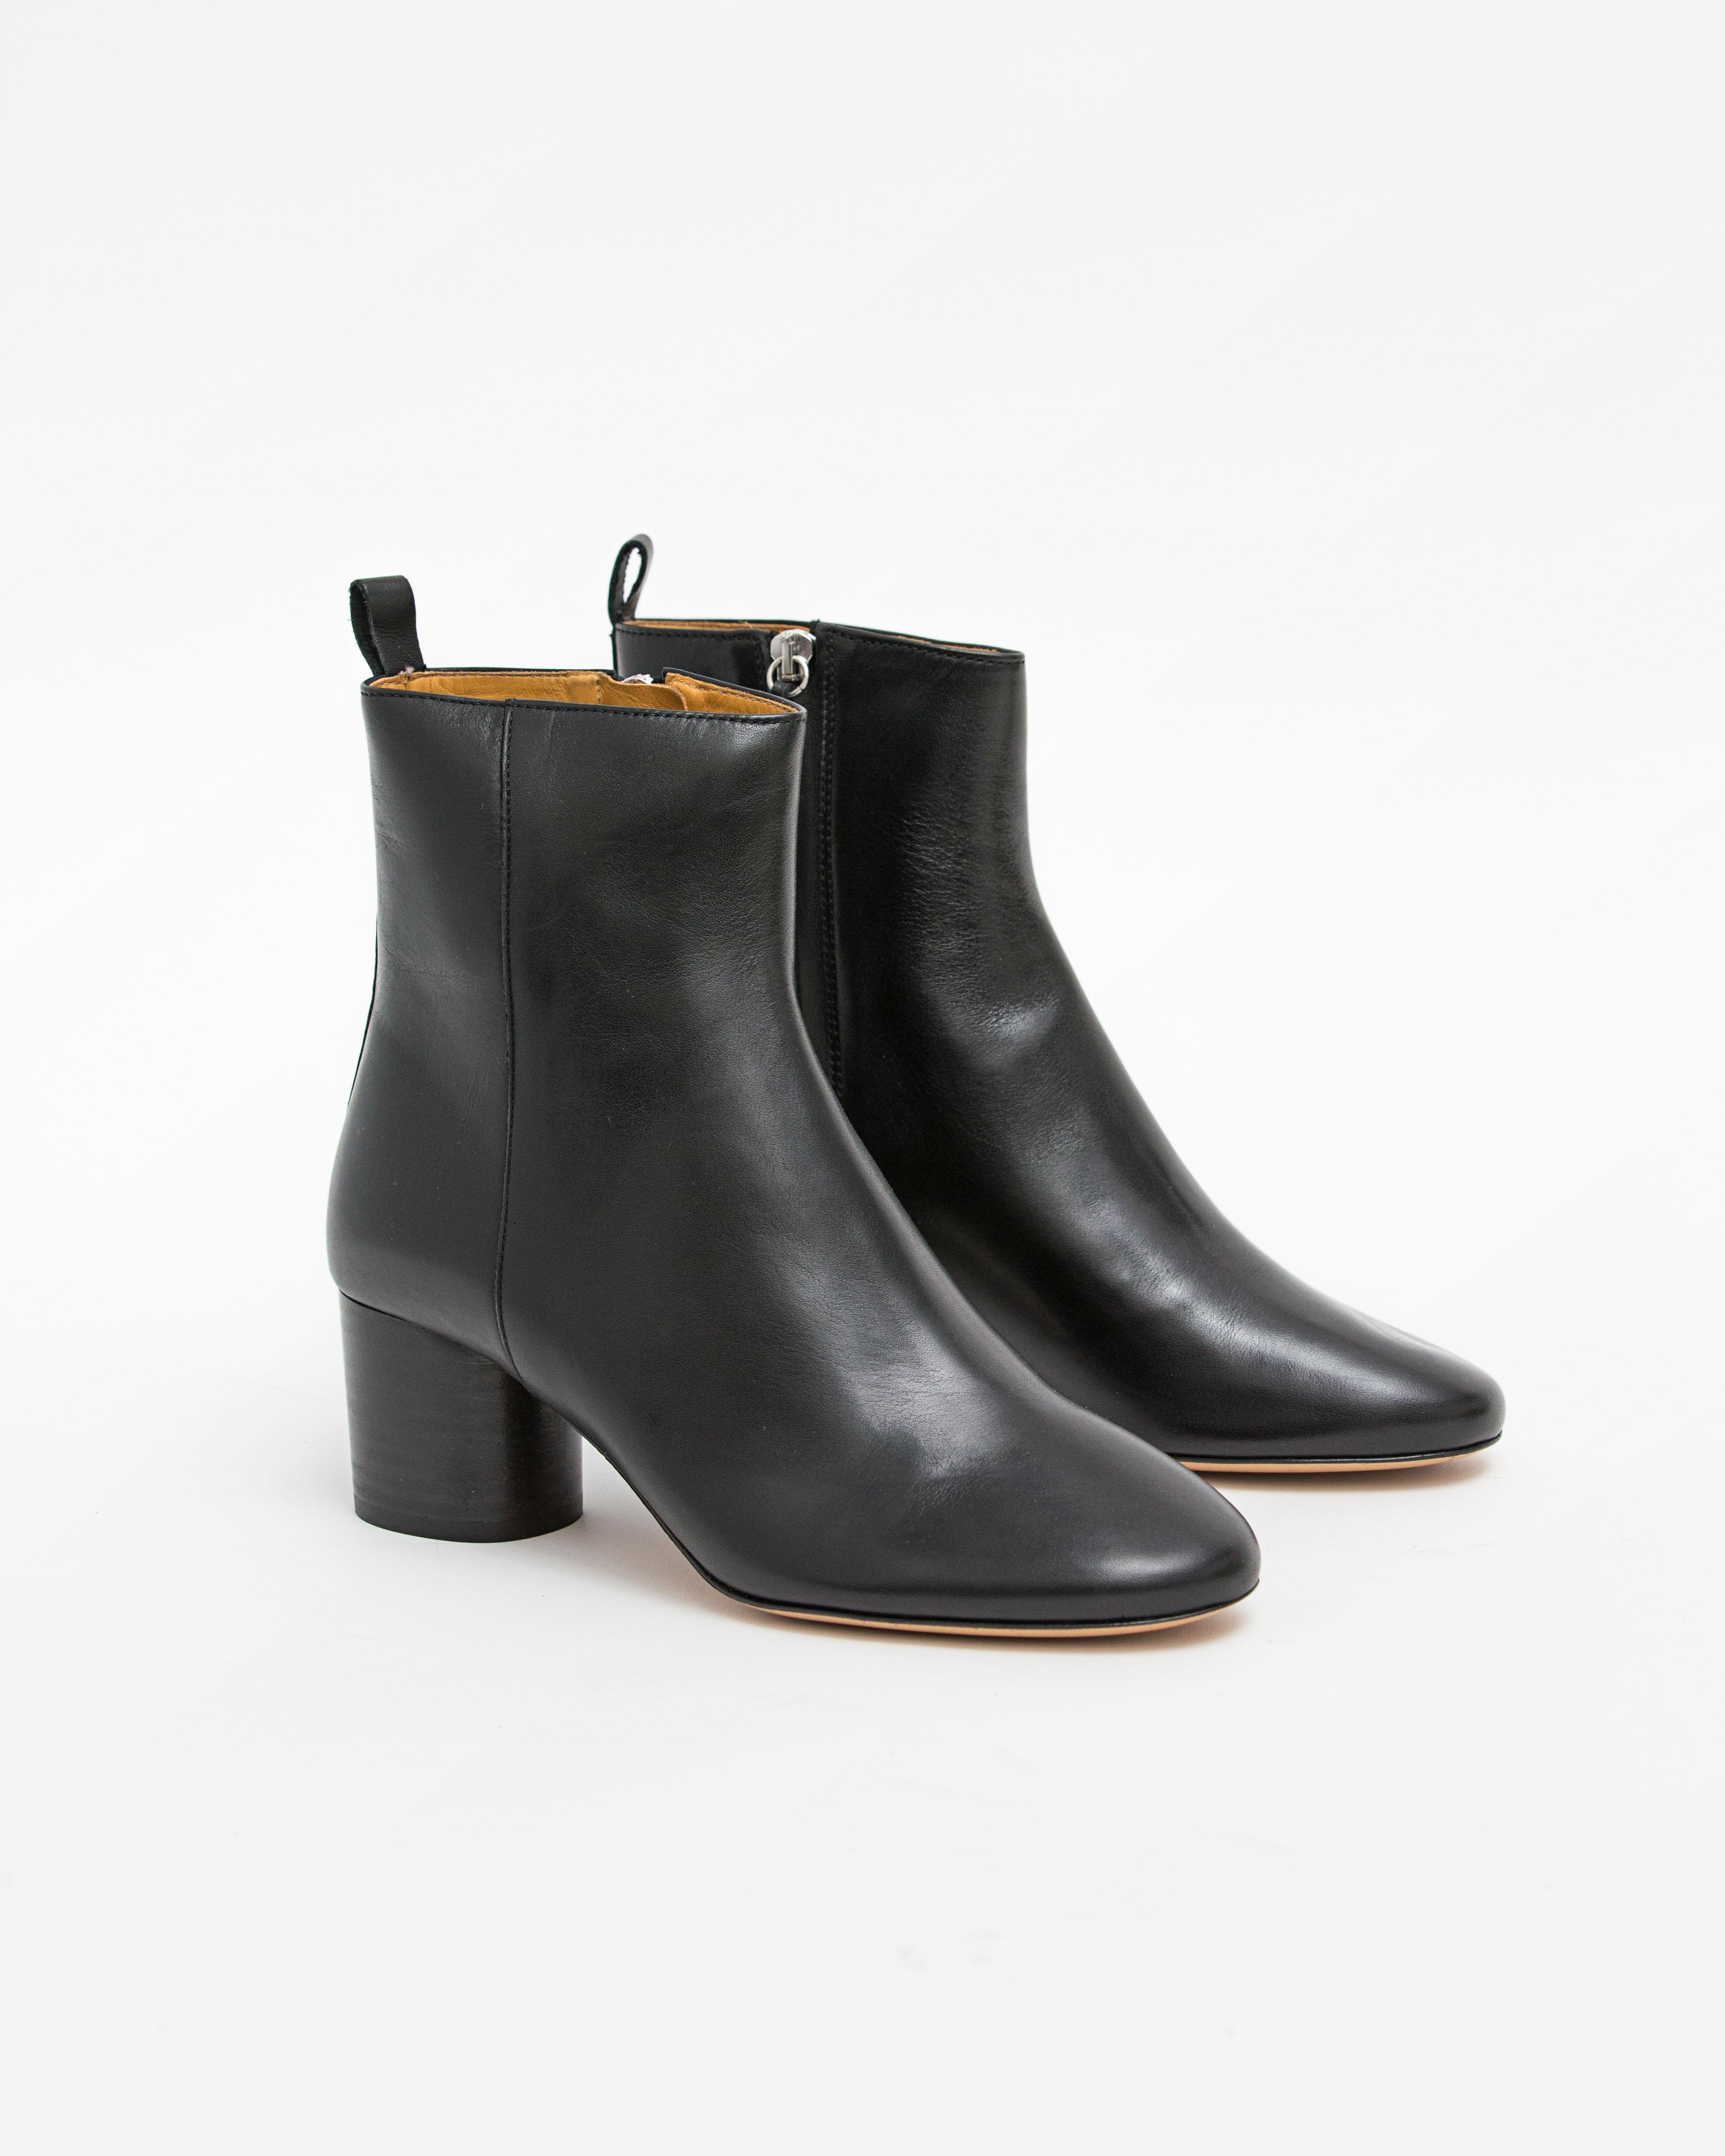 Isabel Marant Etoile 6 - Deyissa Ankle Boot - Black